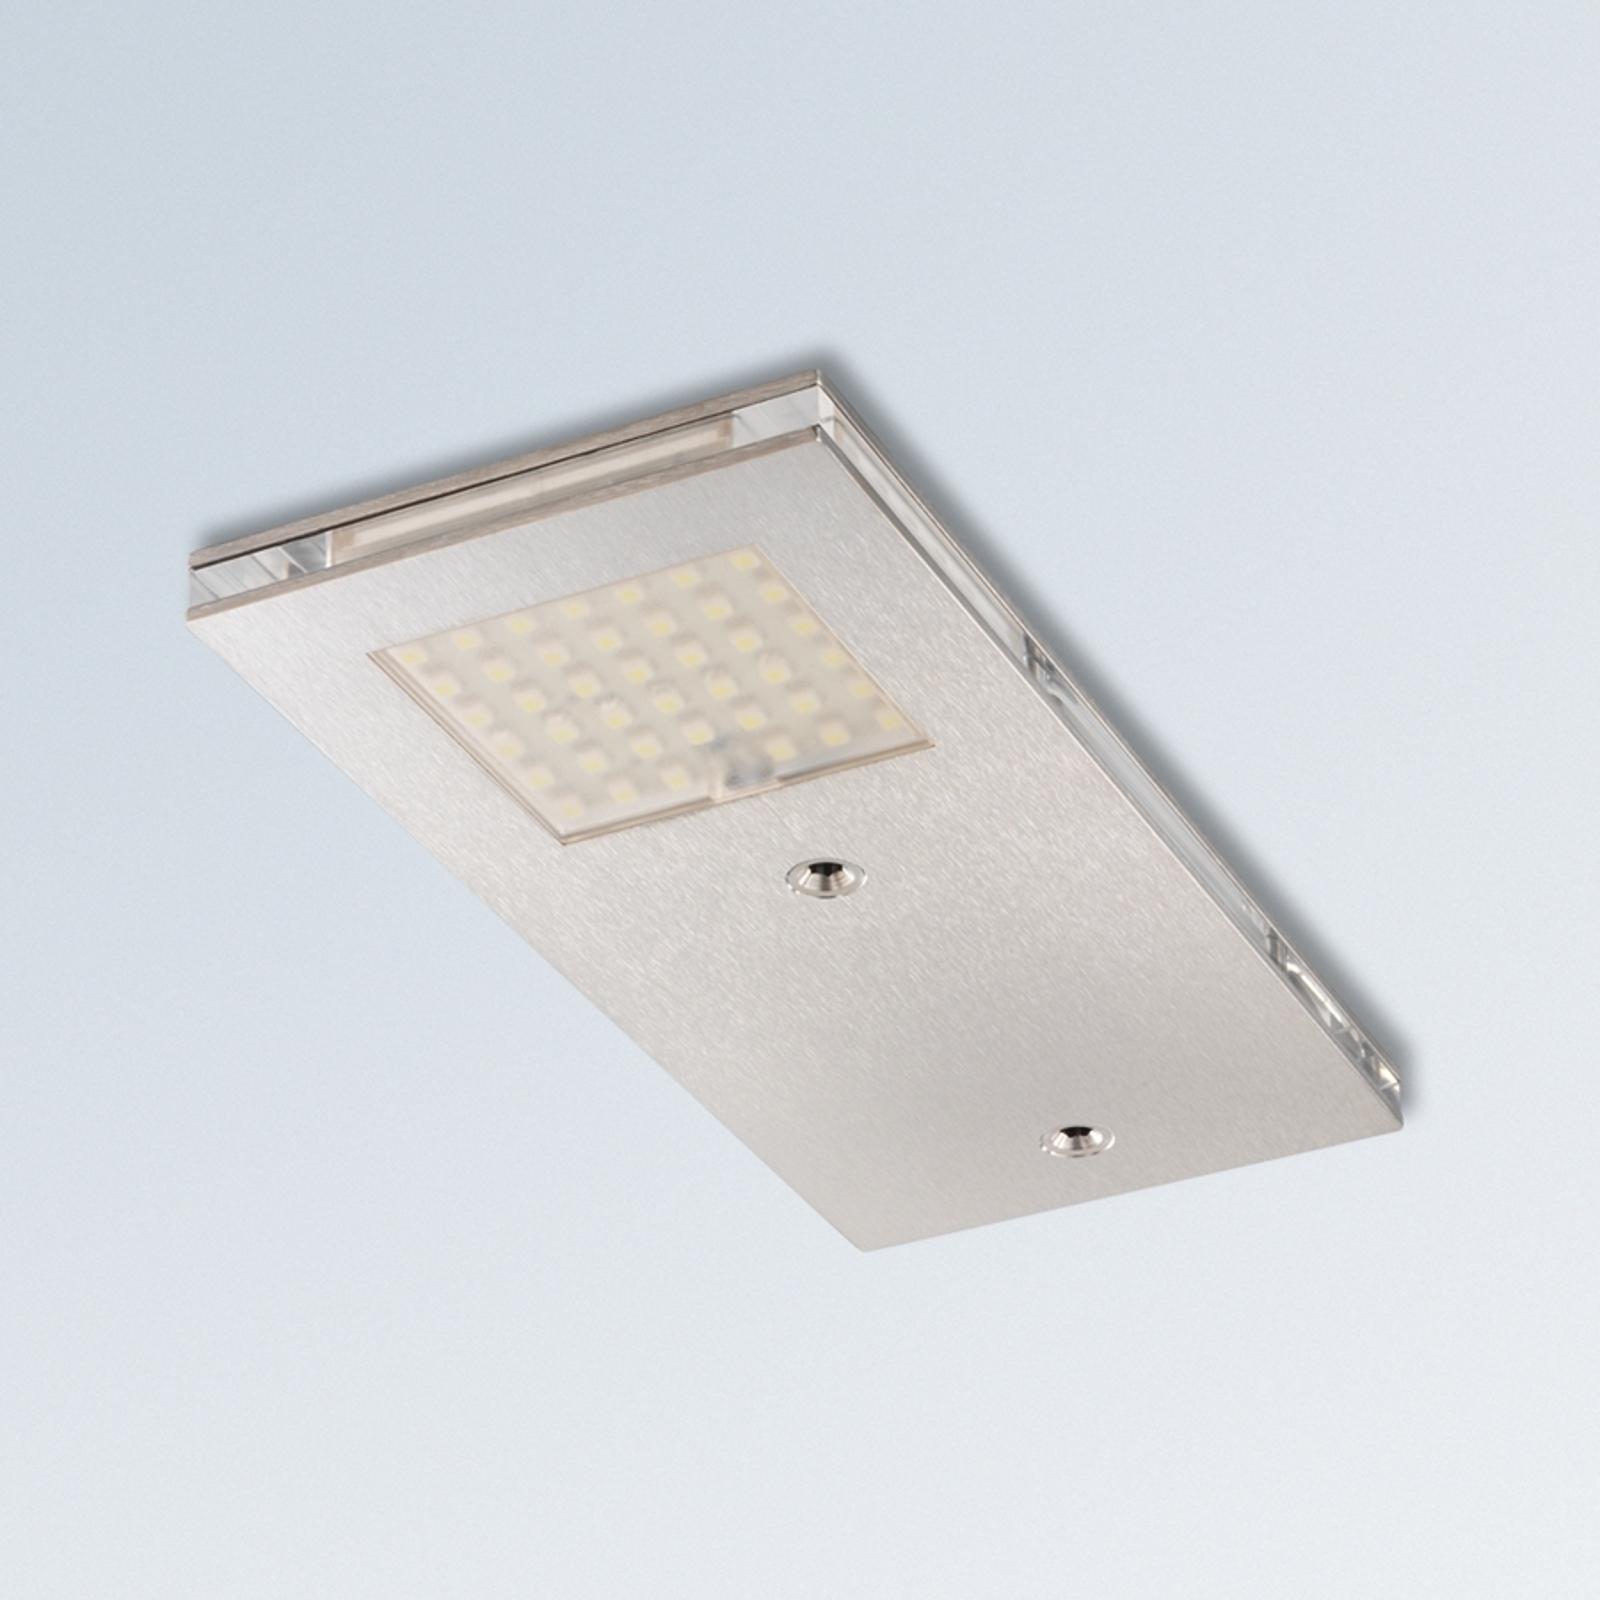 Moderni Flat I-LED-kaapinalusvalaisin